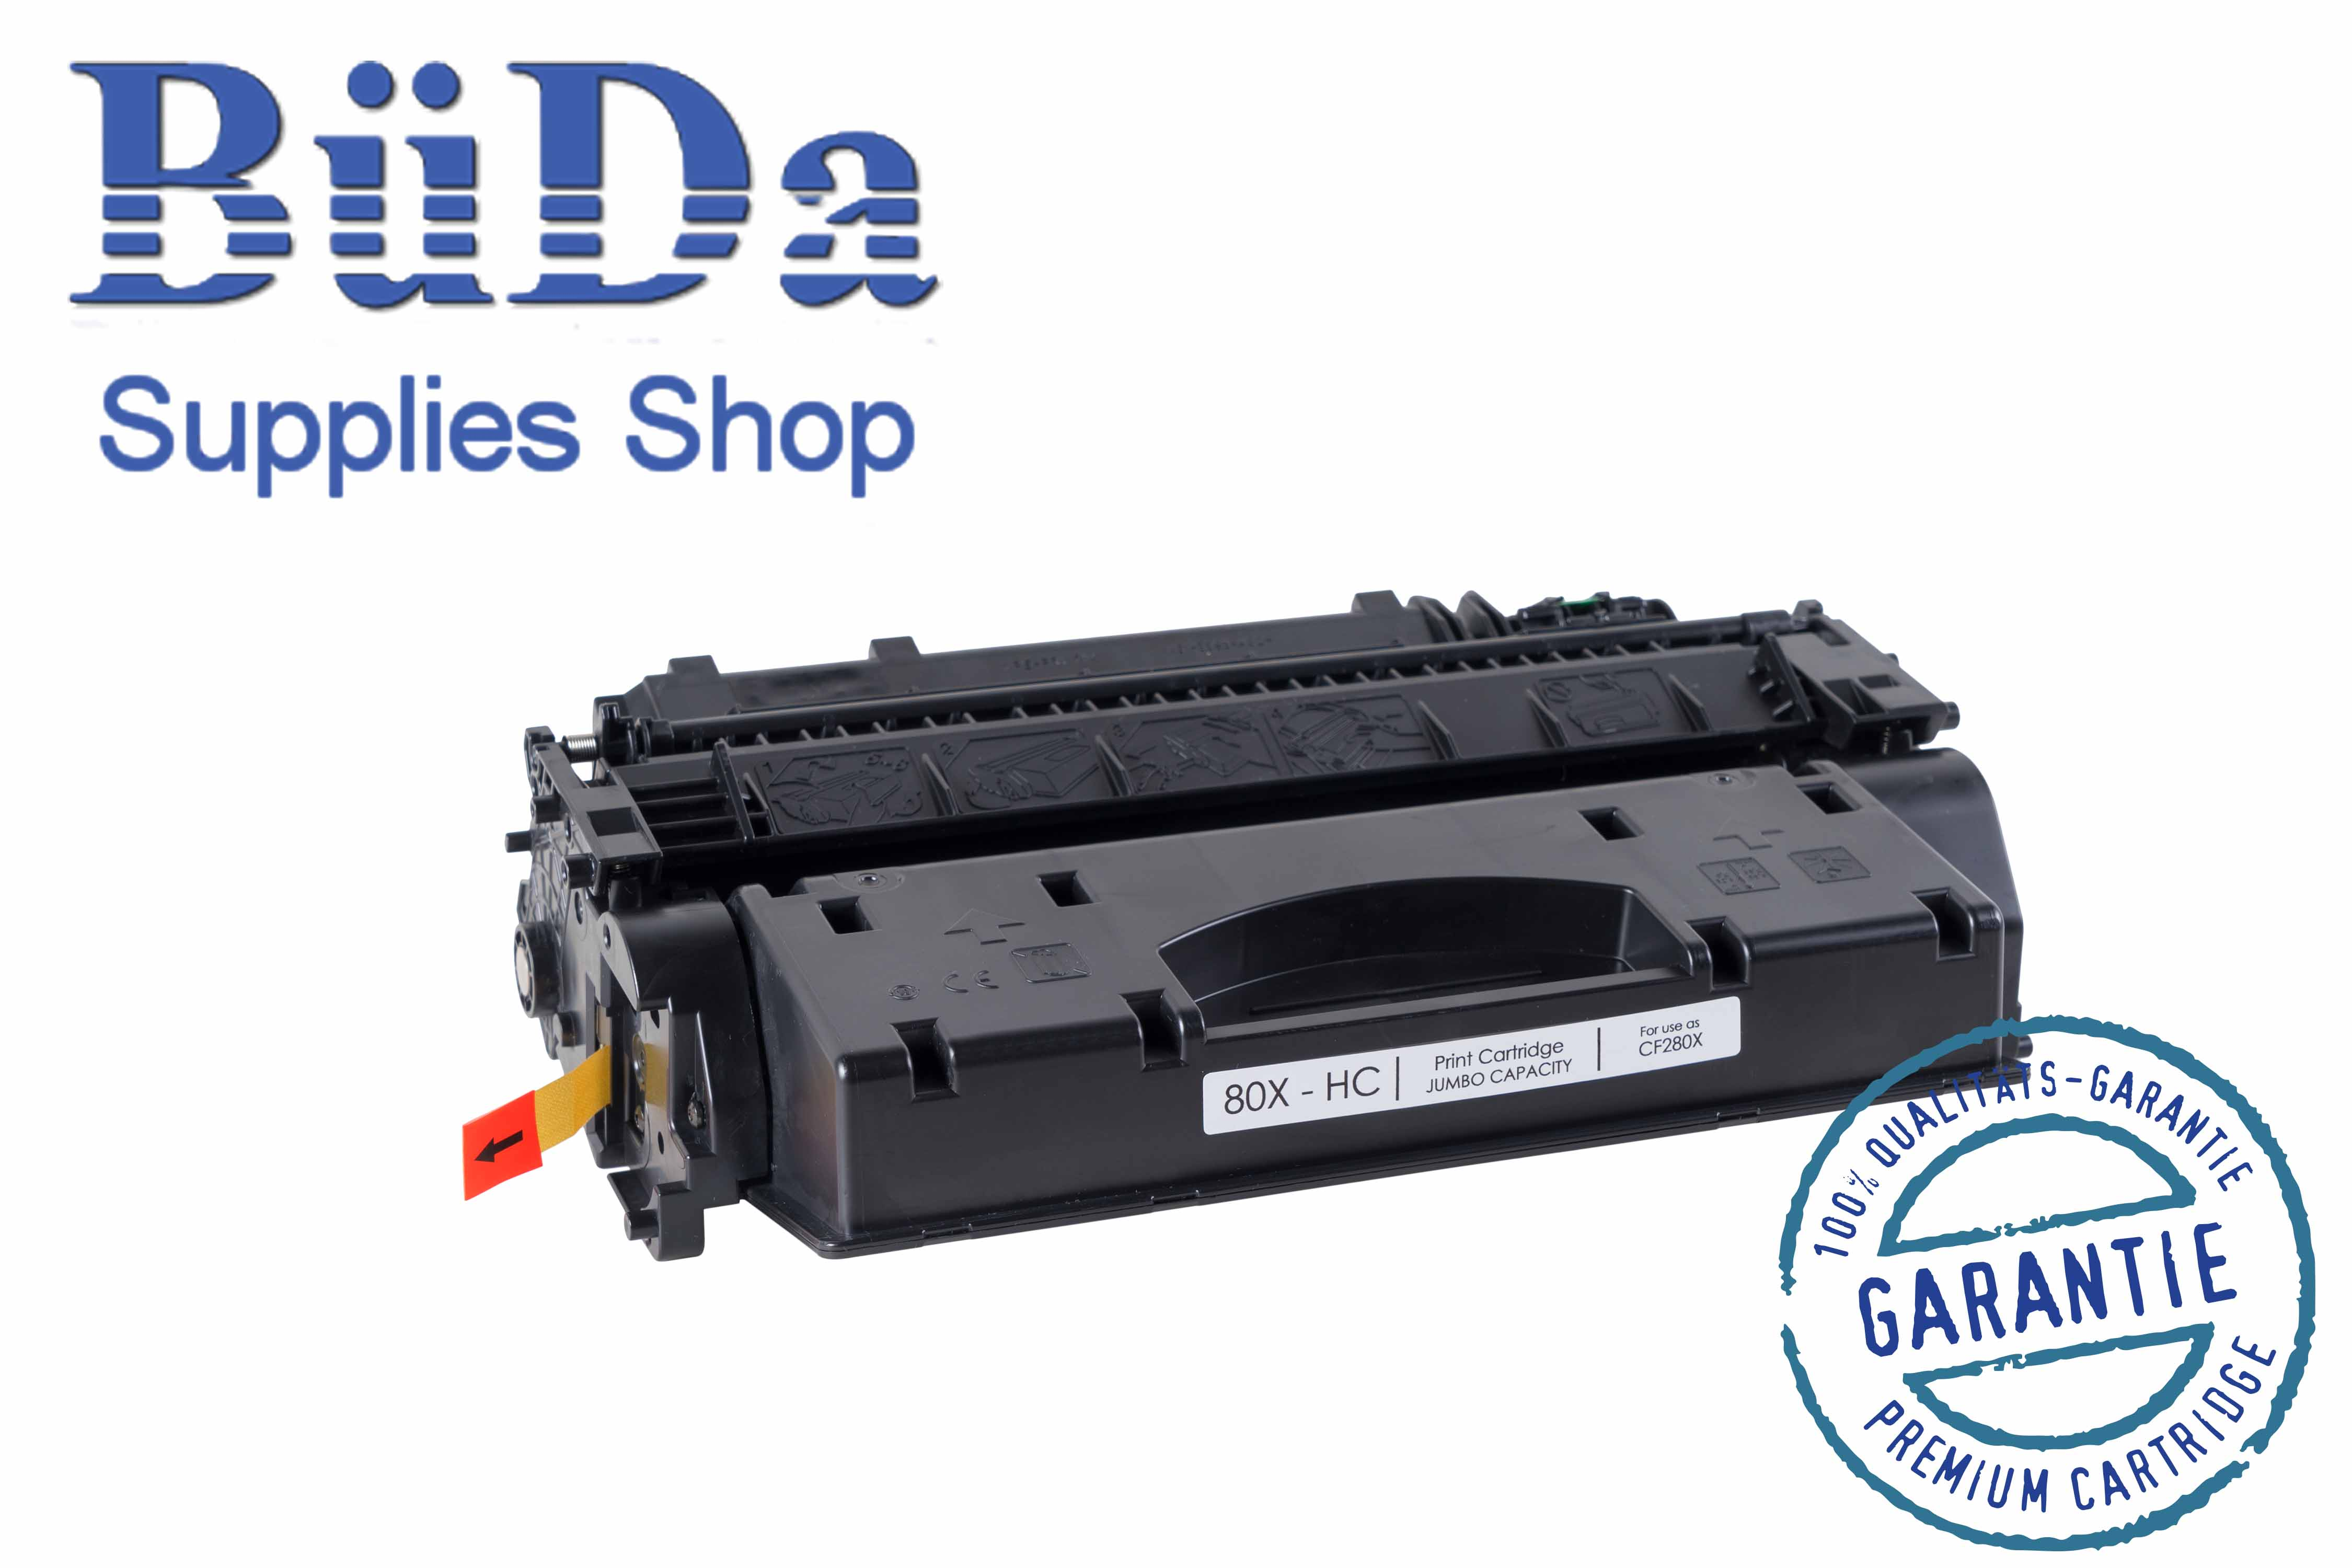 Toner-Modul komp. zu CF280X-HC black 13000 Seiten